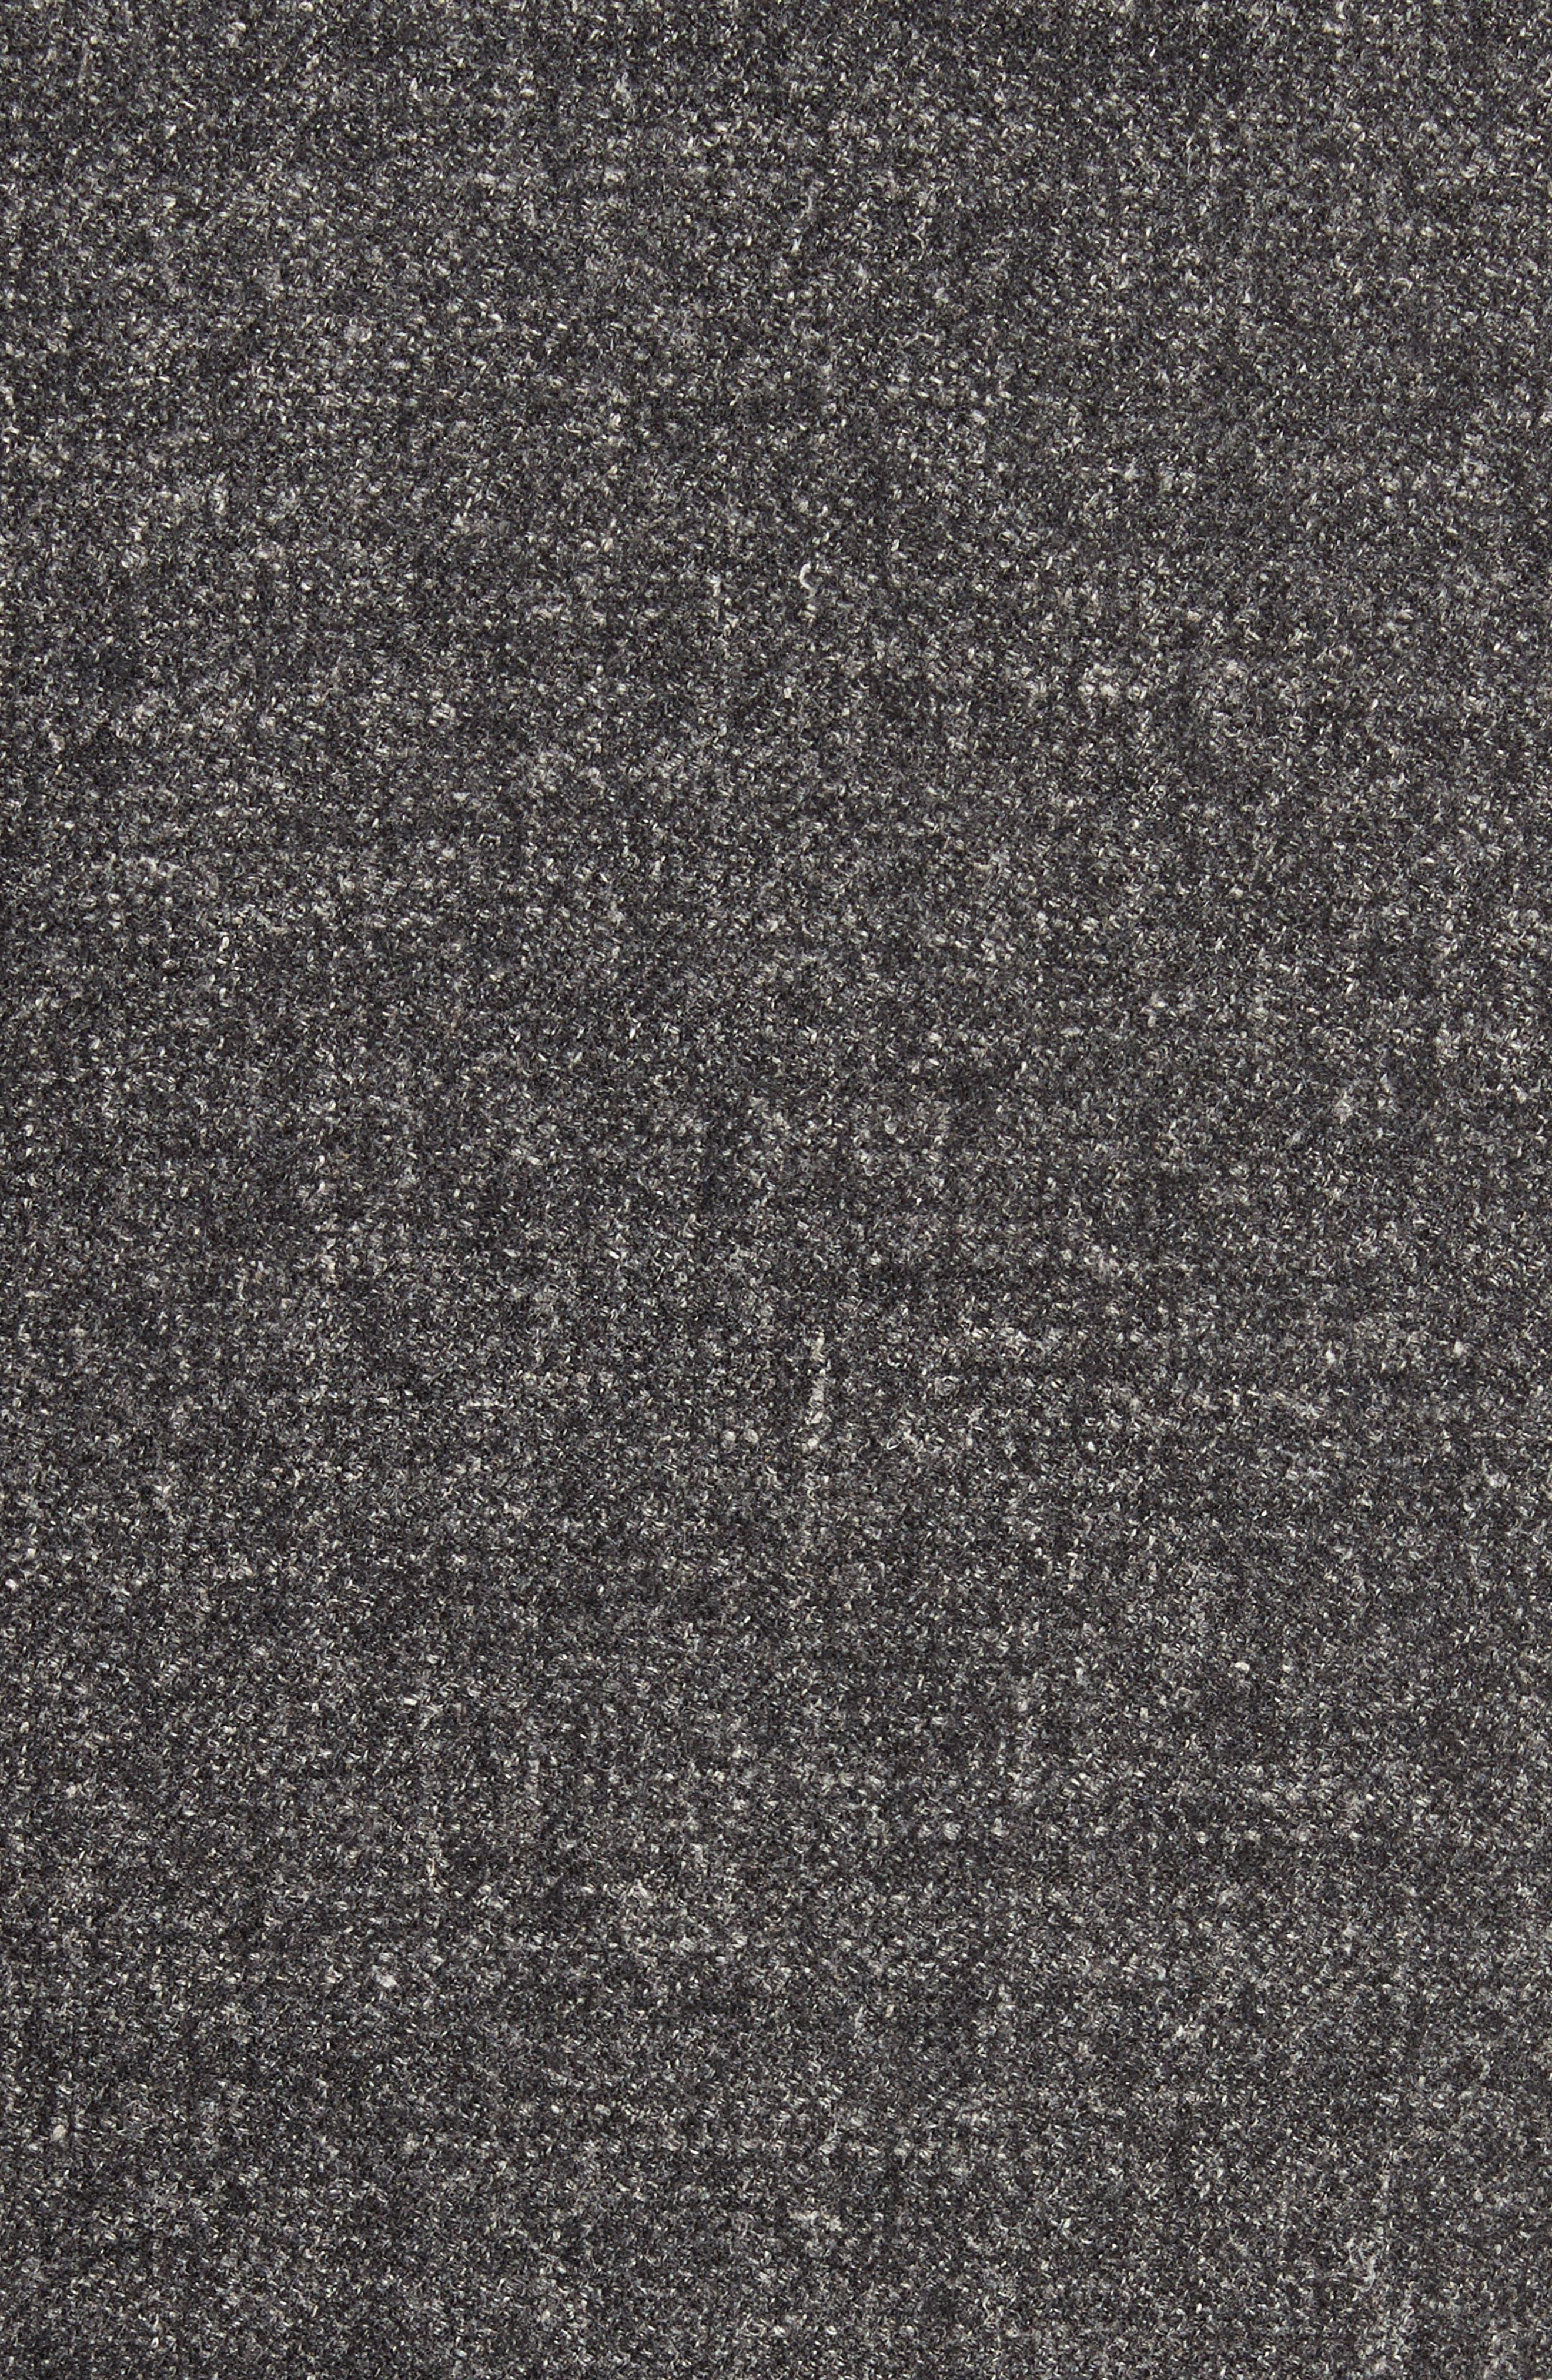 Walsh Wool & Linen Topcoat,                             Alternate thumbnail 5, color,                             Black/ Grey